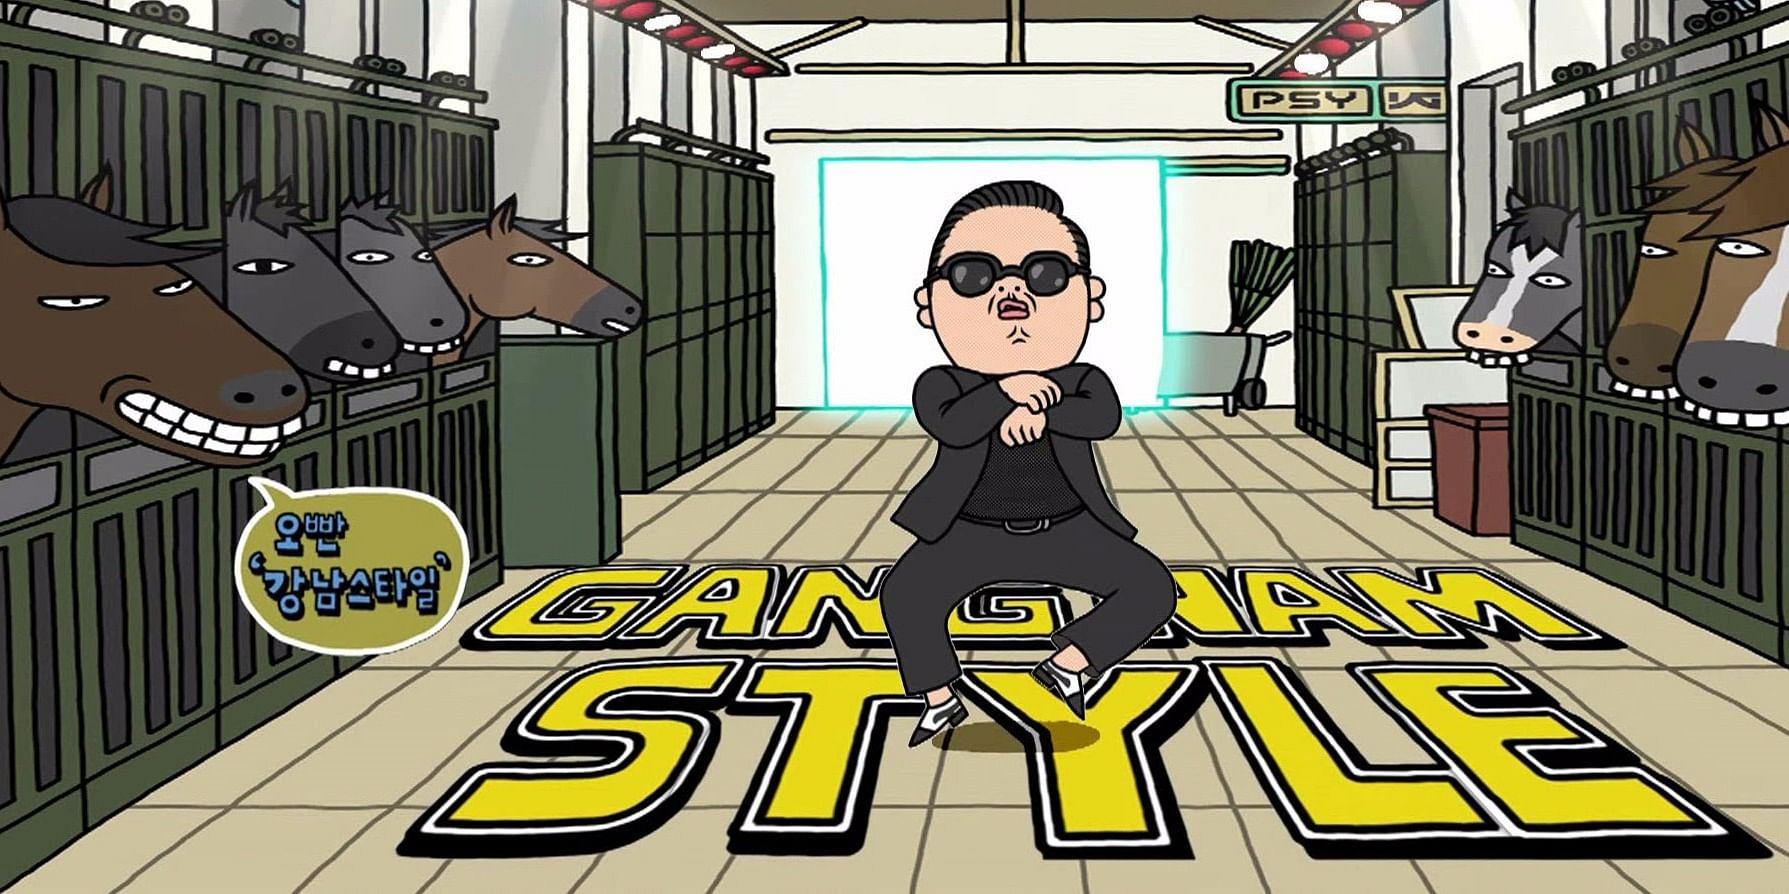 Photo Credits: PSY Gangnam Style